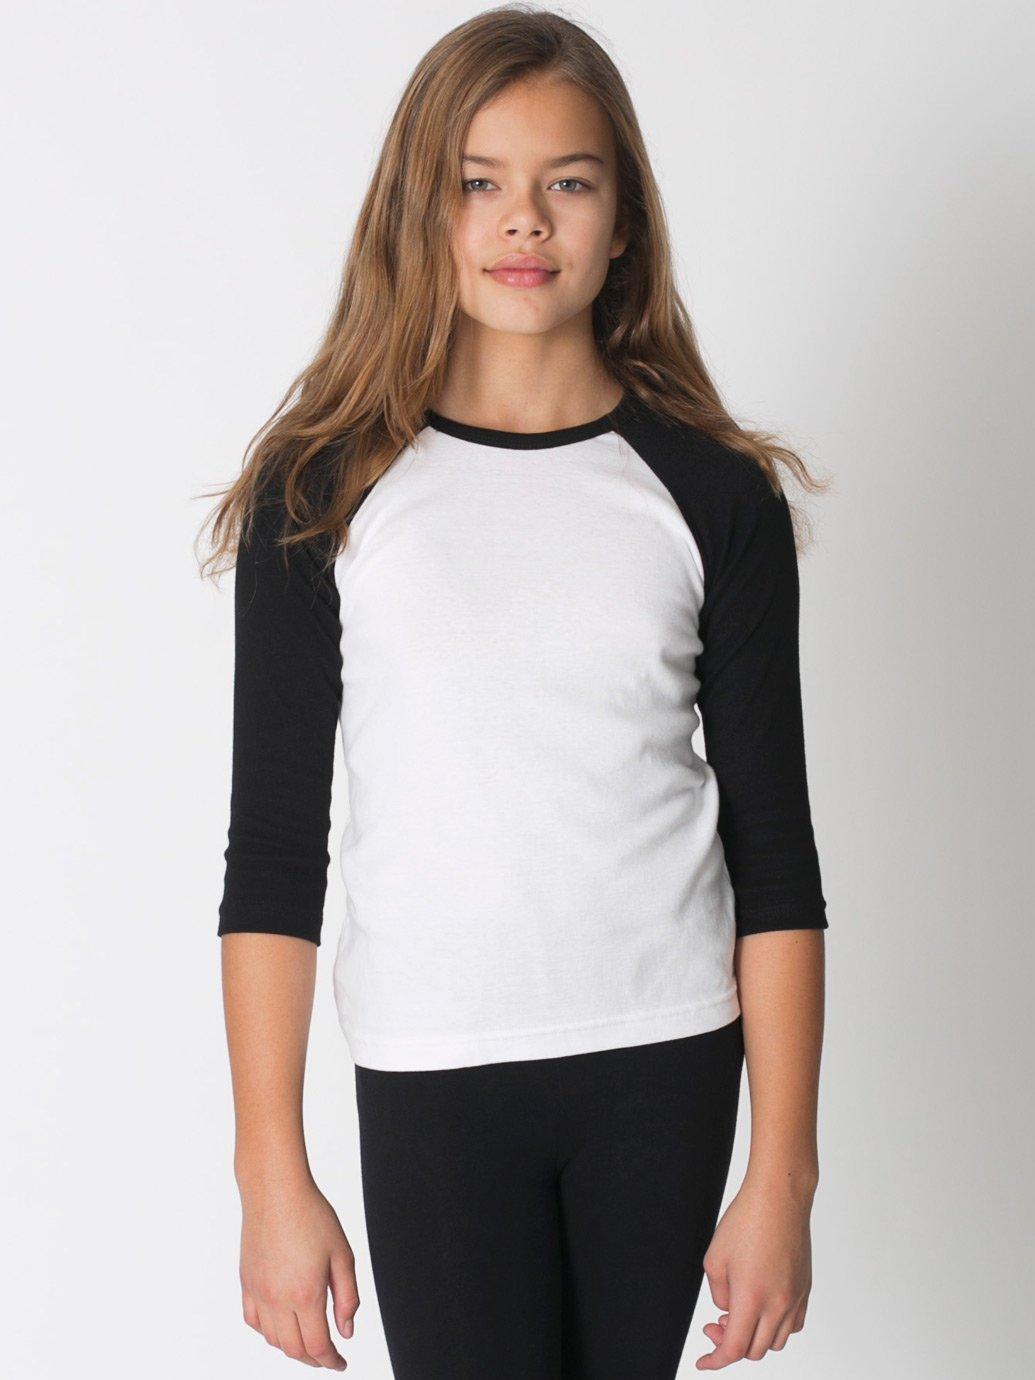 American apparel youth baby rib 3 4 sleeve raglan evan for 3 4 sleeve shirt template